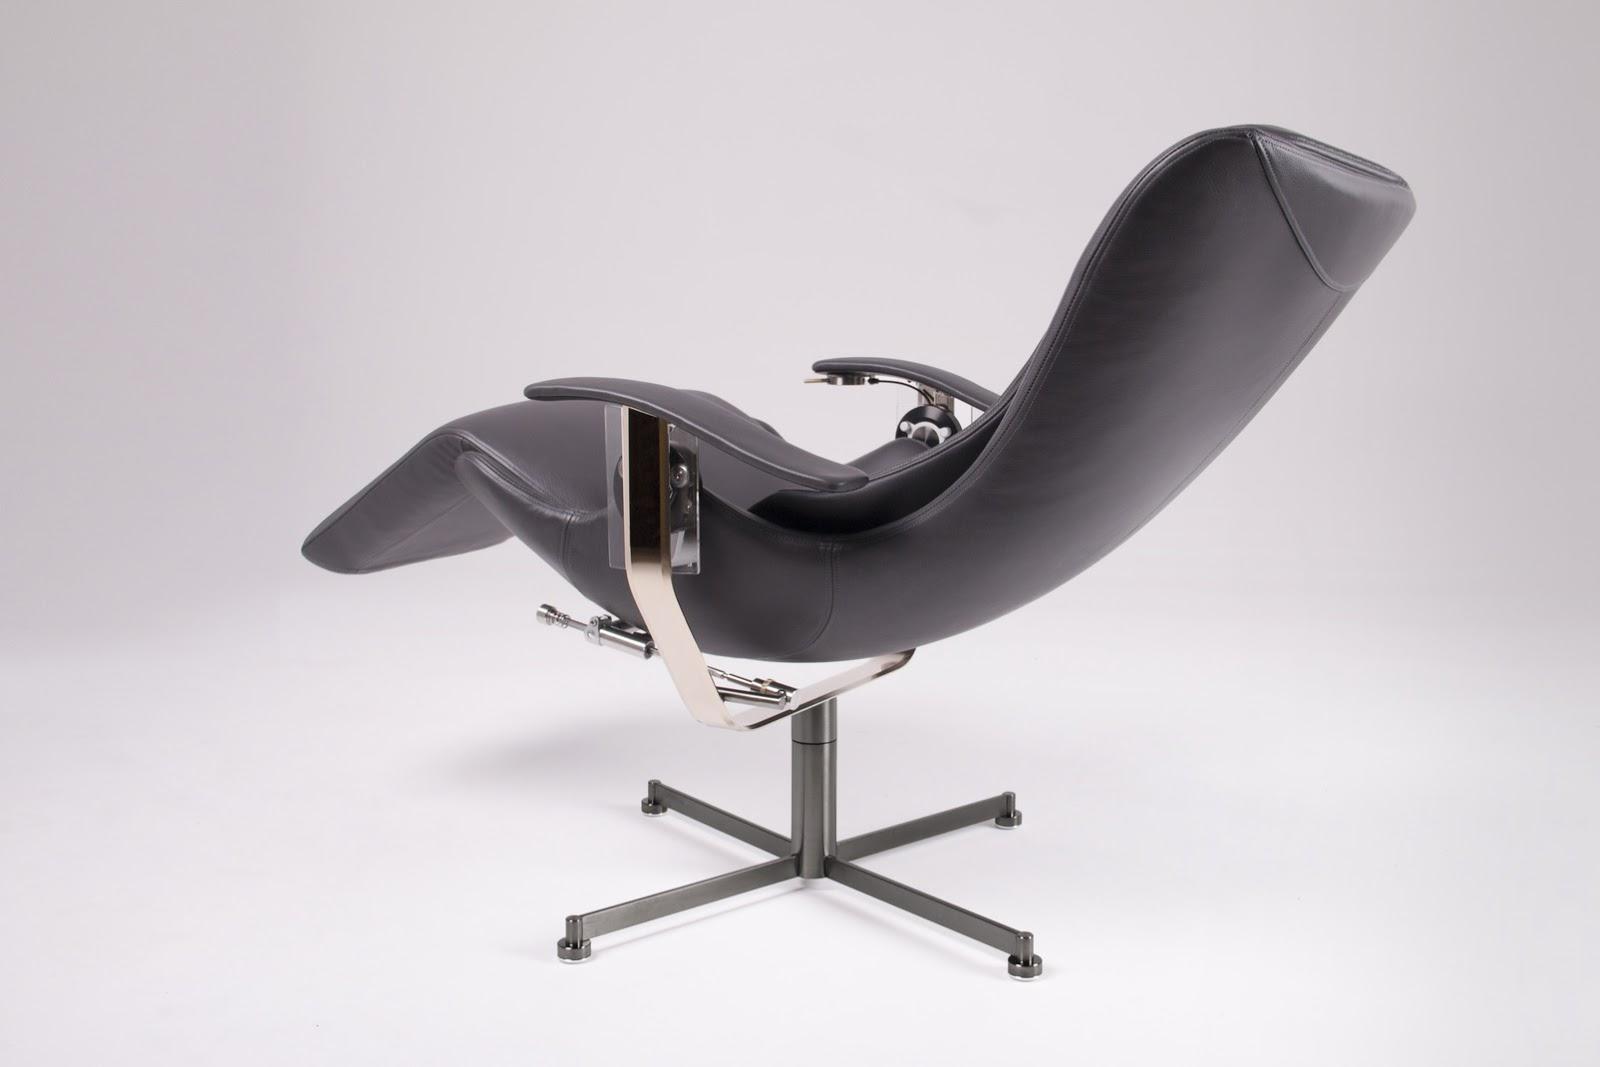 rolls-elysium-r-advanced-seat-4